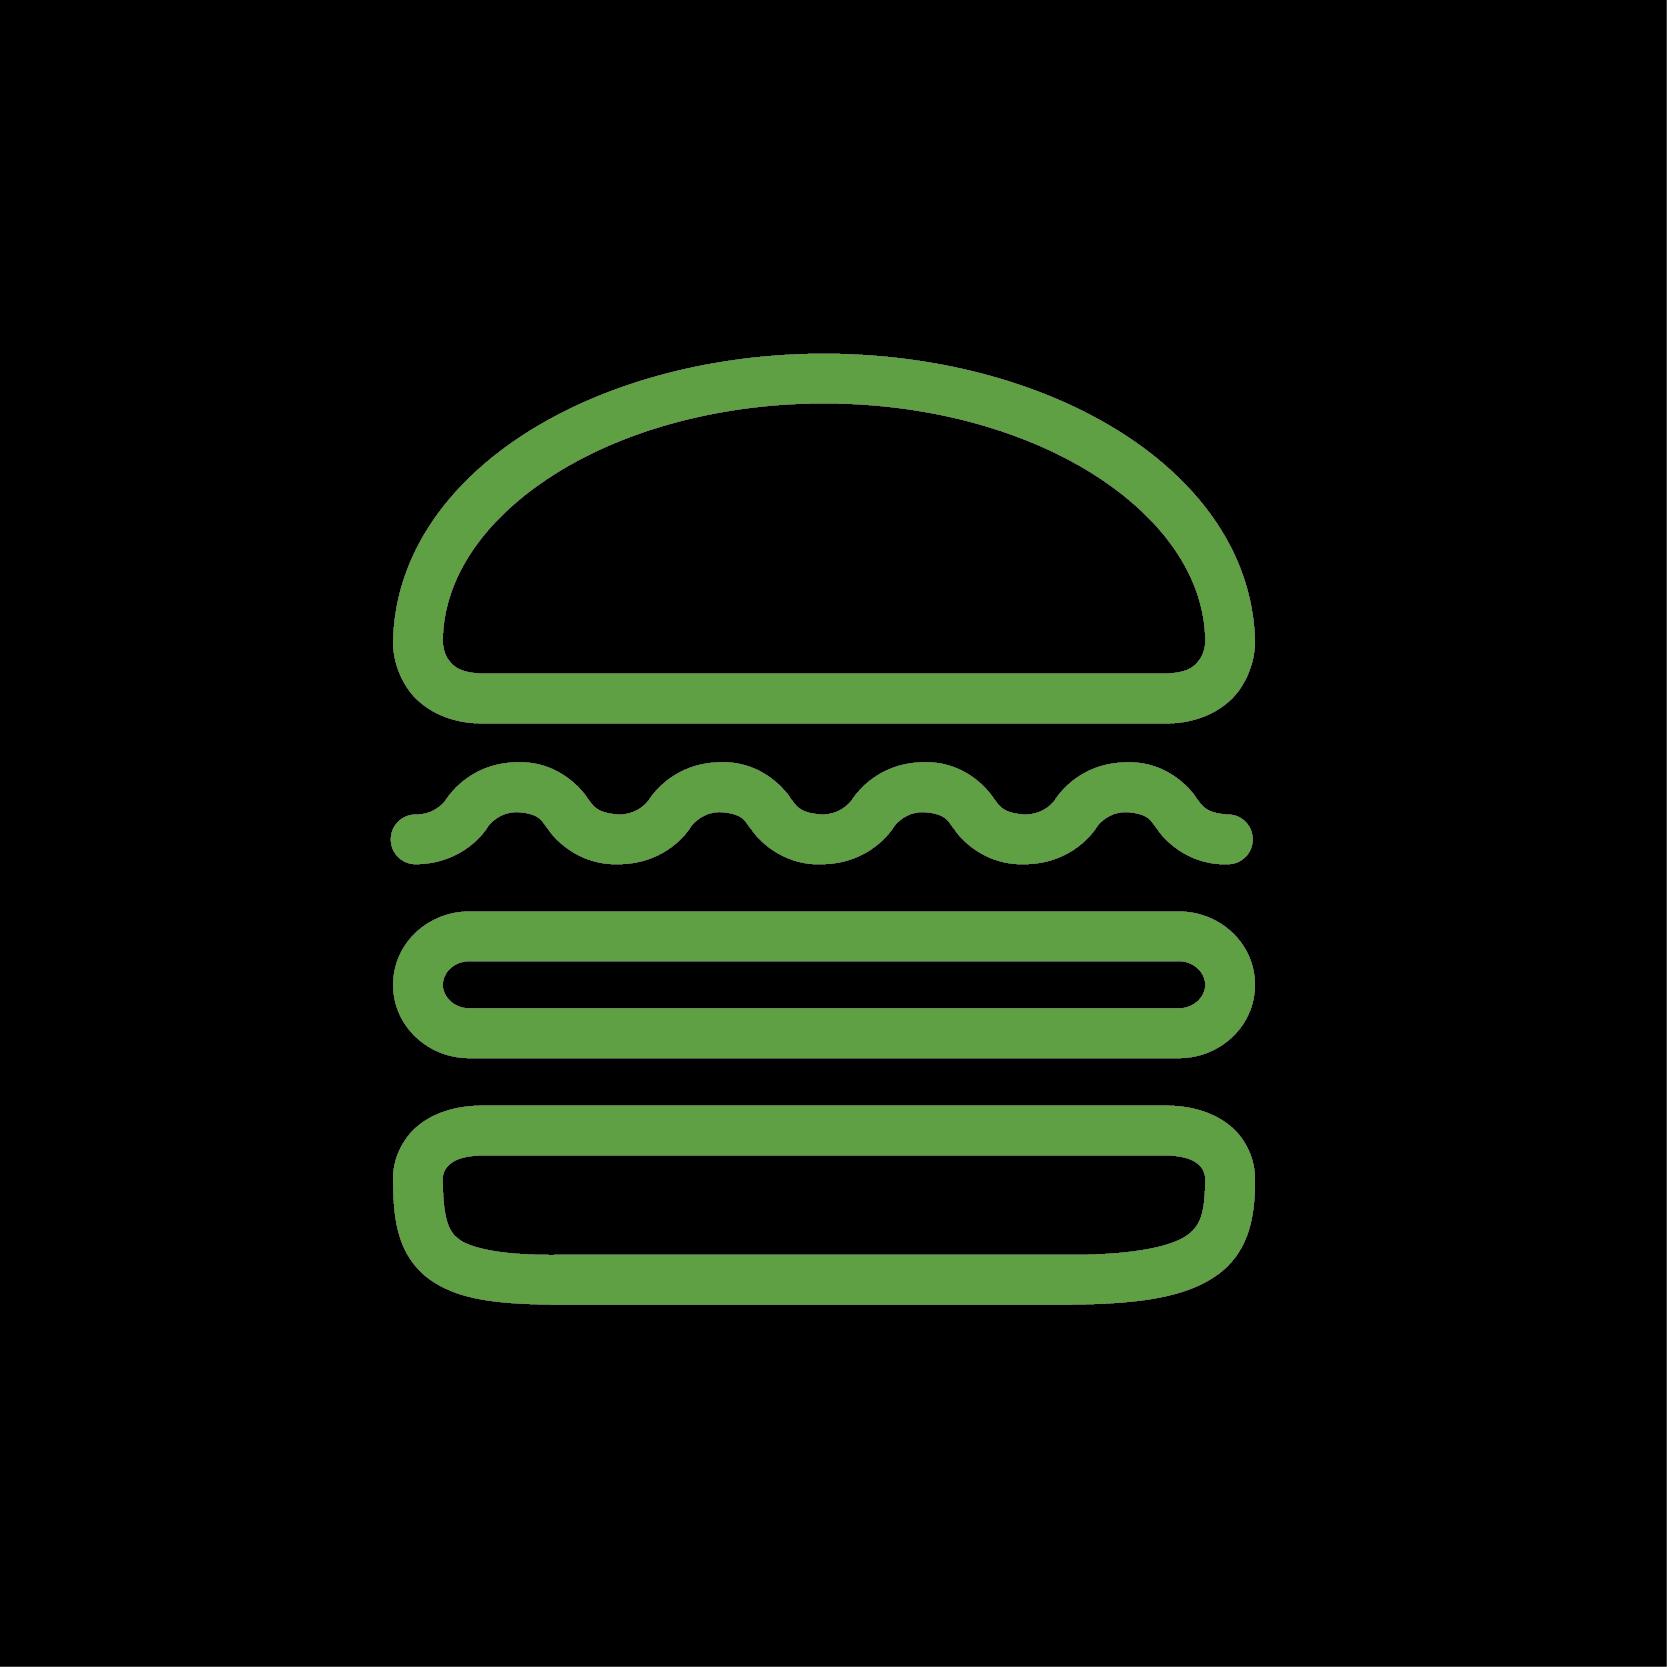 Shake-Shack_Burger_Sml-01 (002)